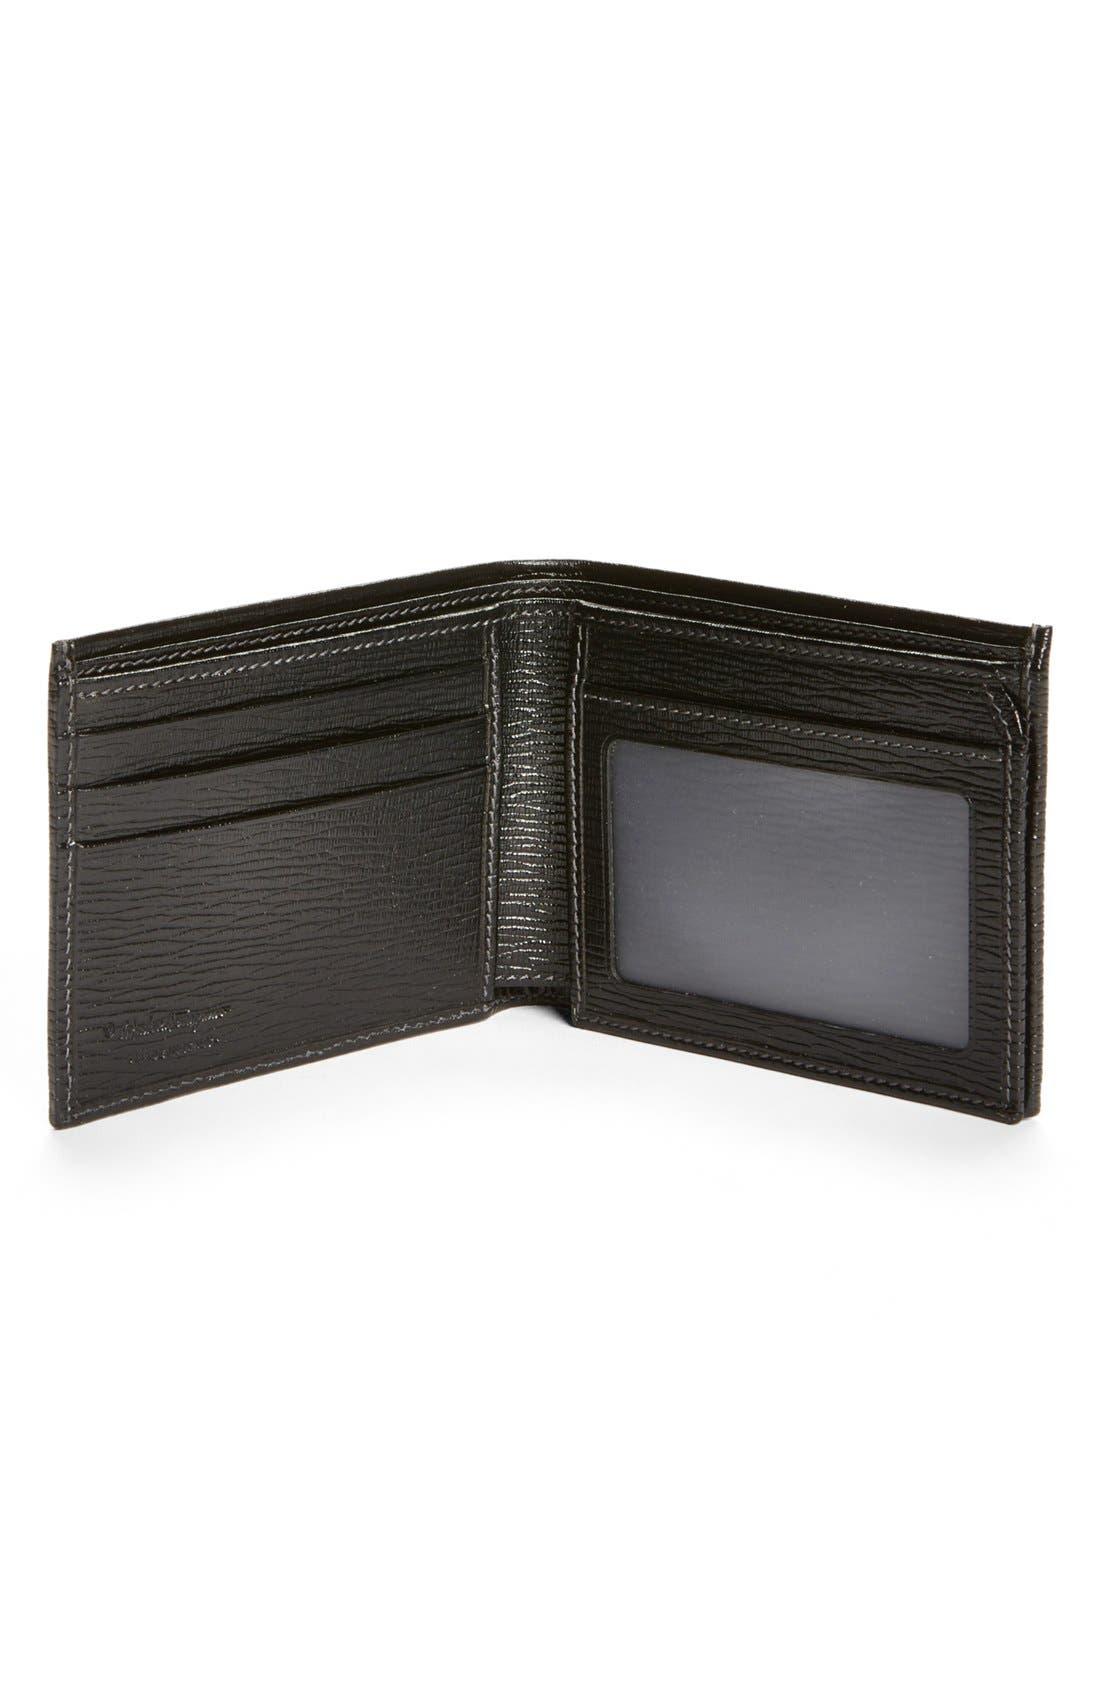 Stamped Calf Wallet,                             Alternate thumbnail 4, color,                             BLACK